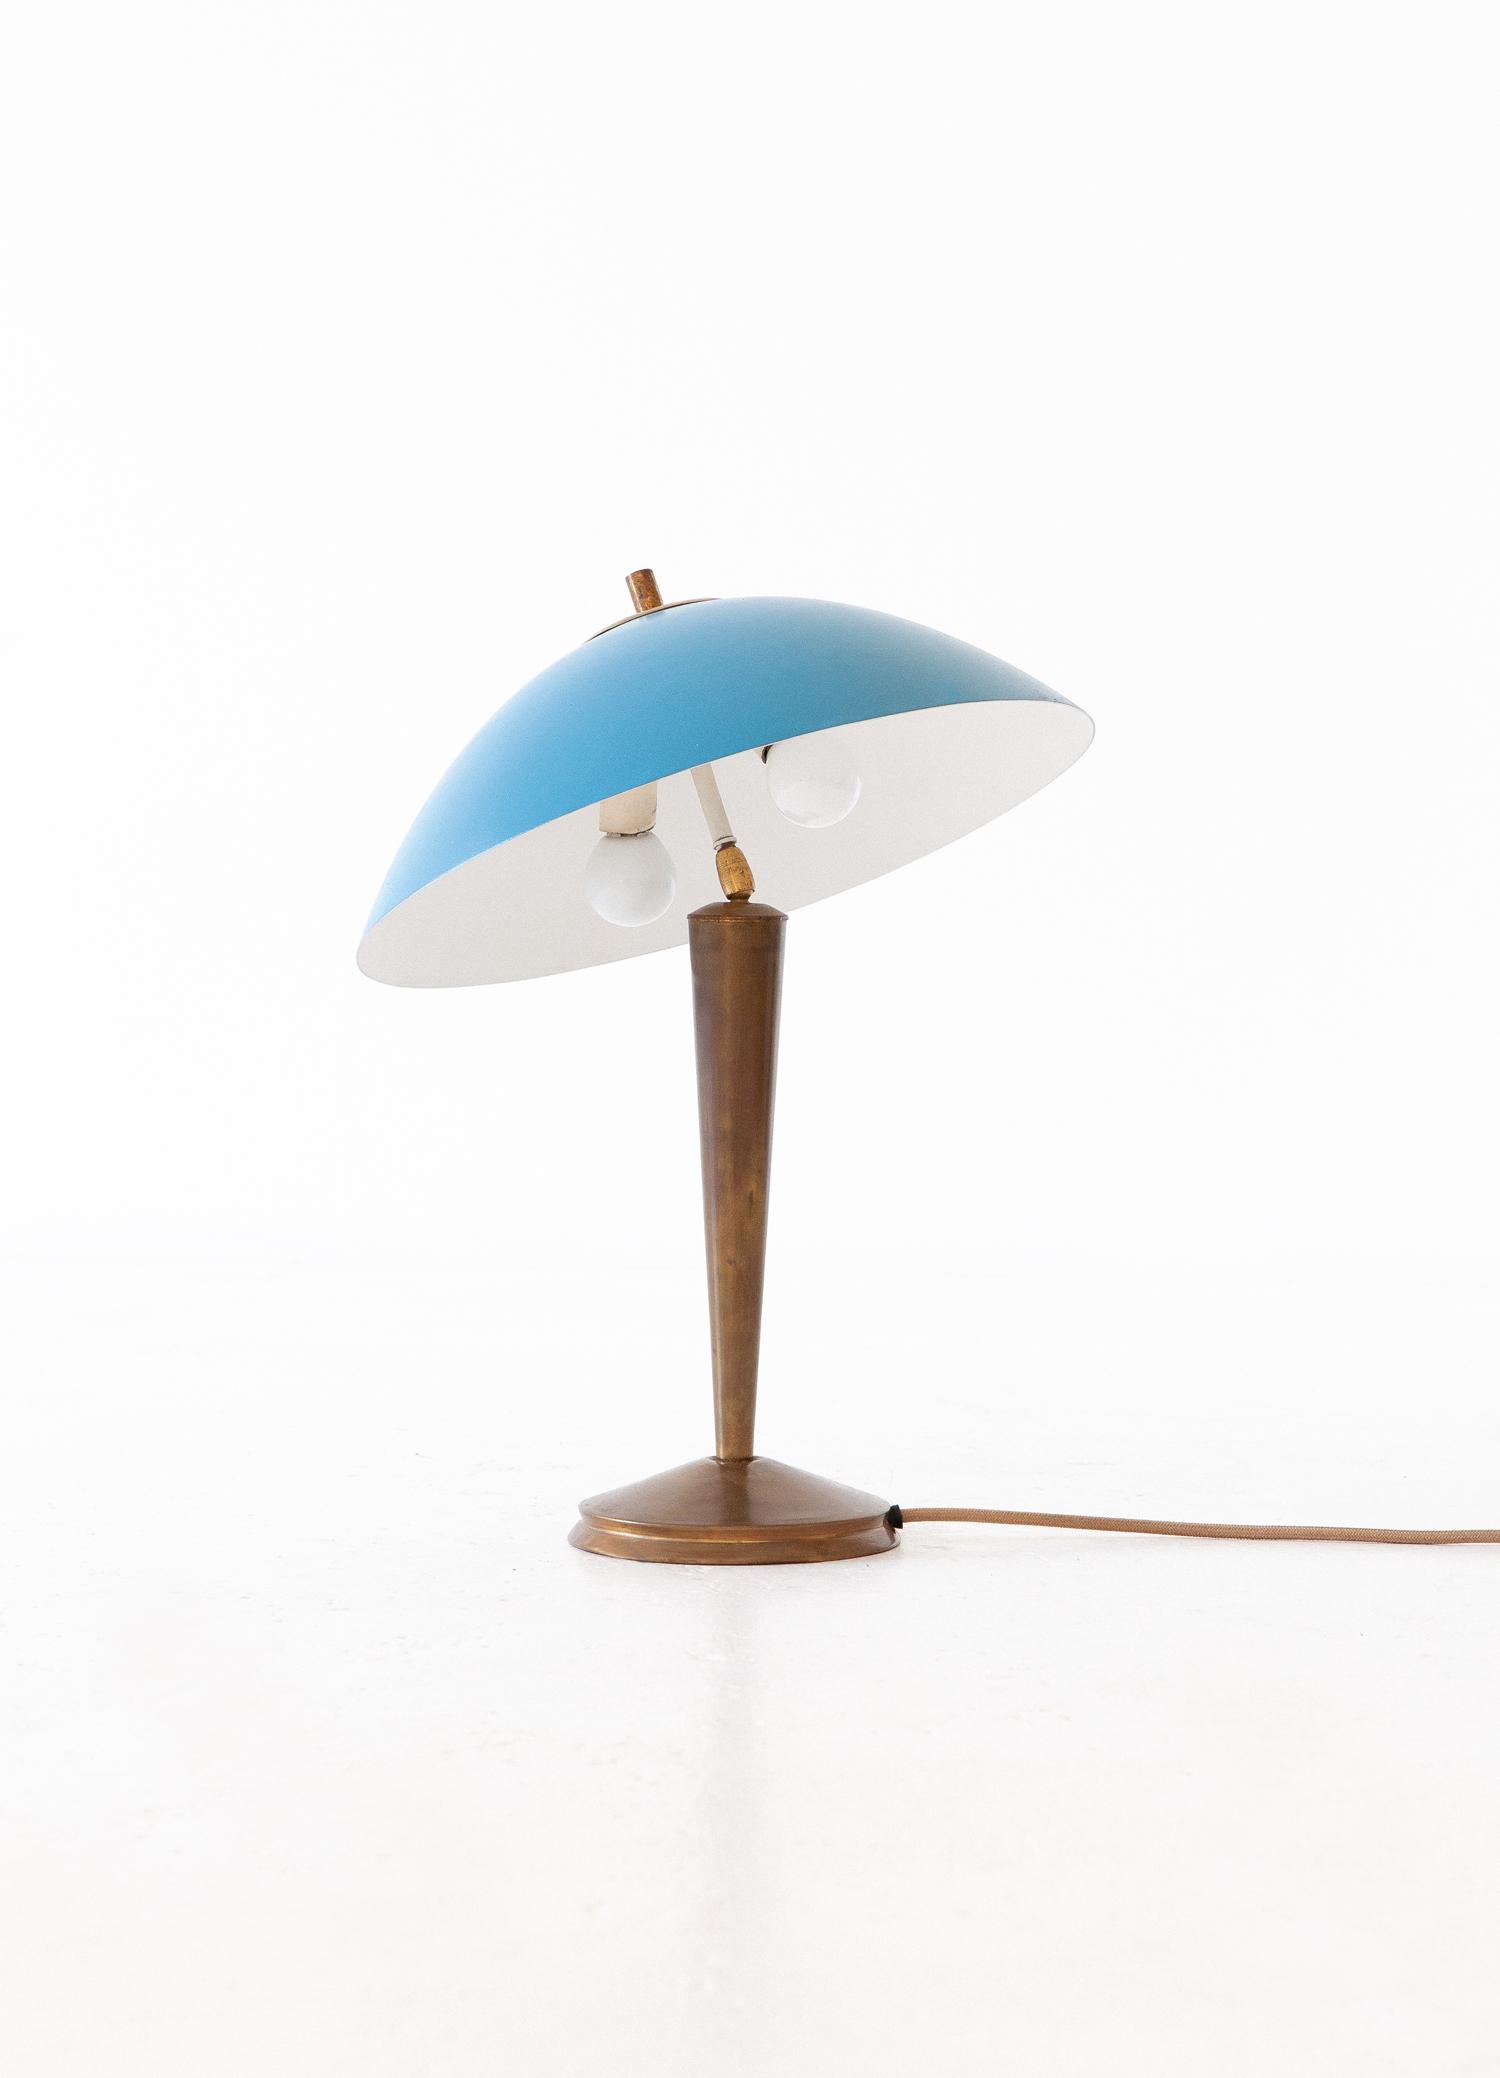 1950s-italian-blue-brass-table-lamp-1-L78